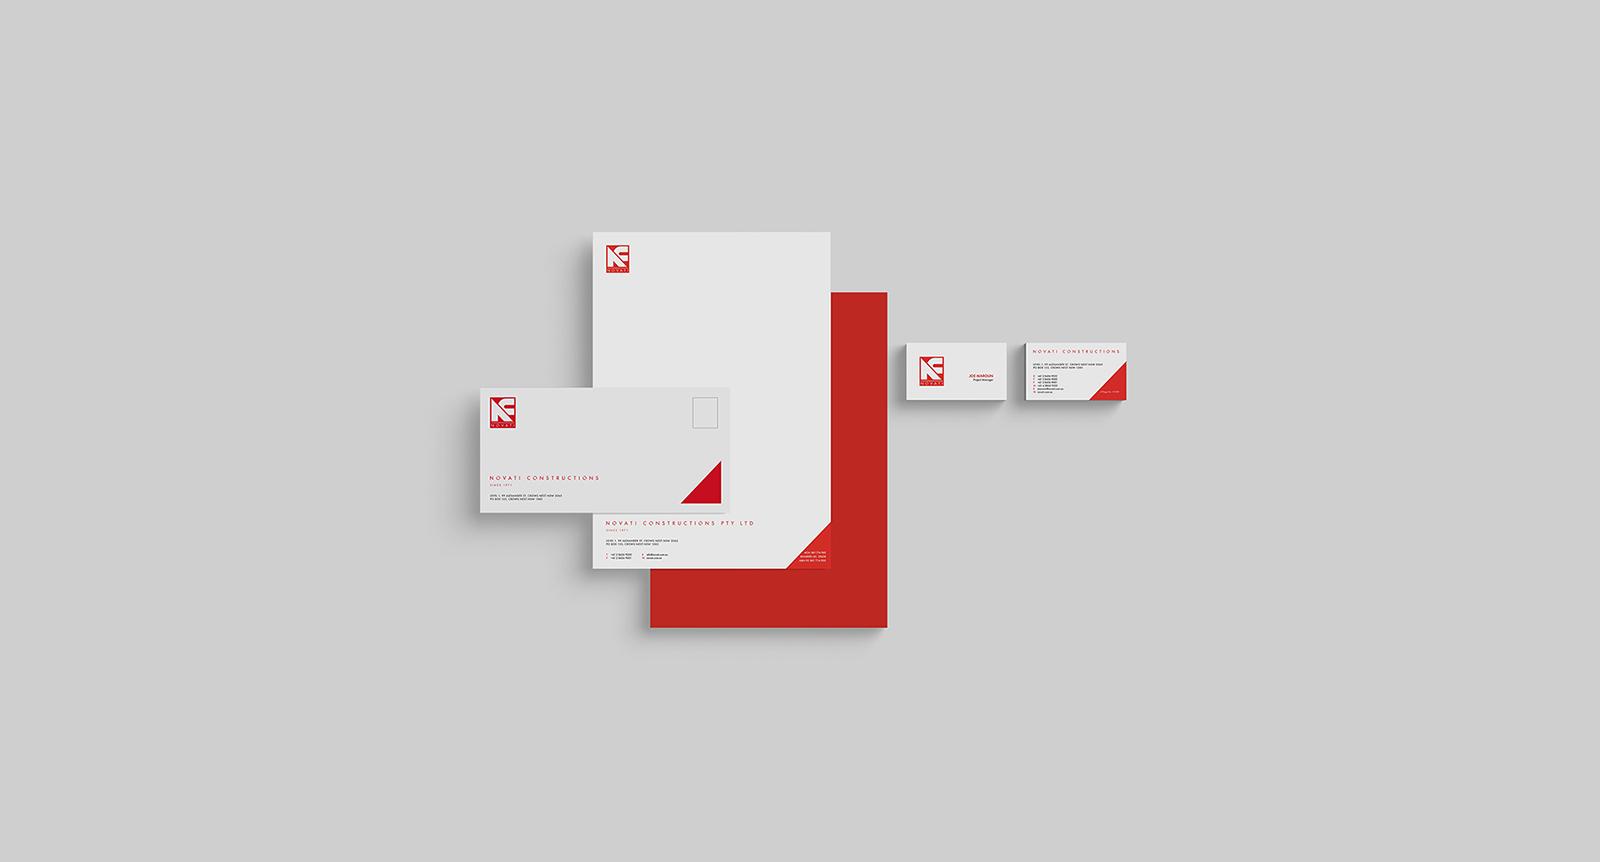 Branding Identity Design Sydney